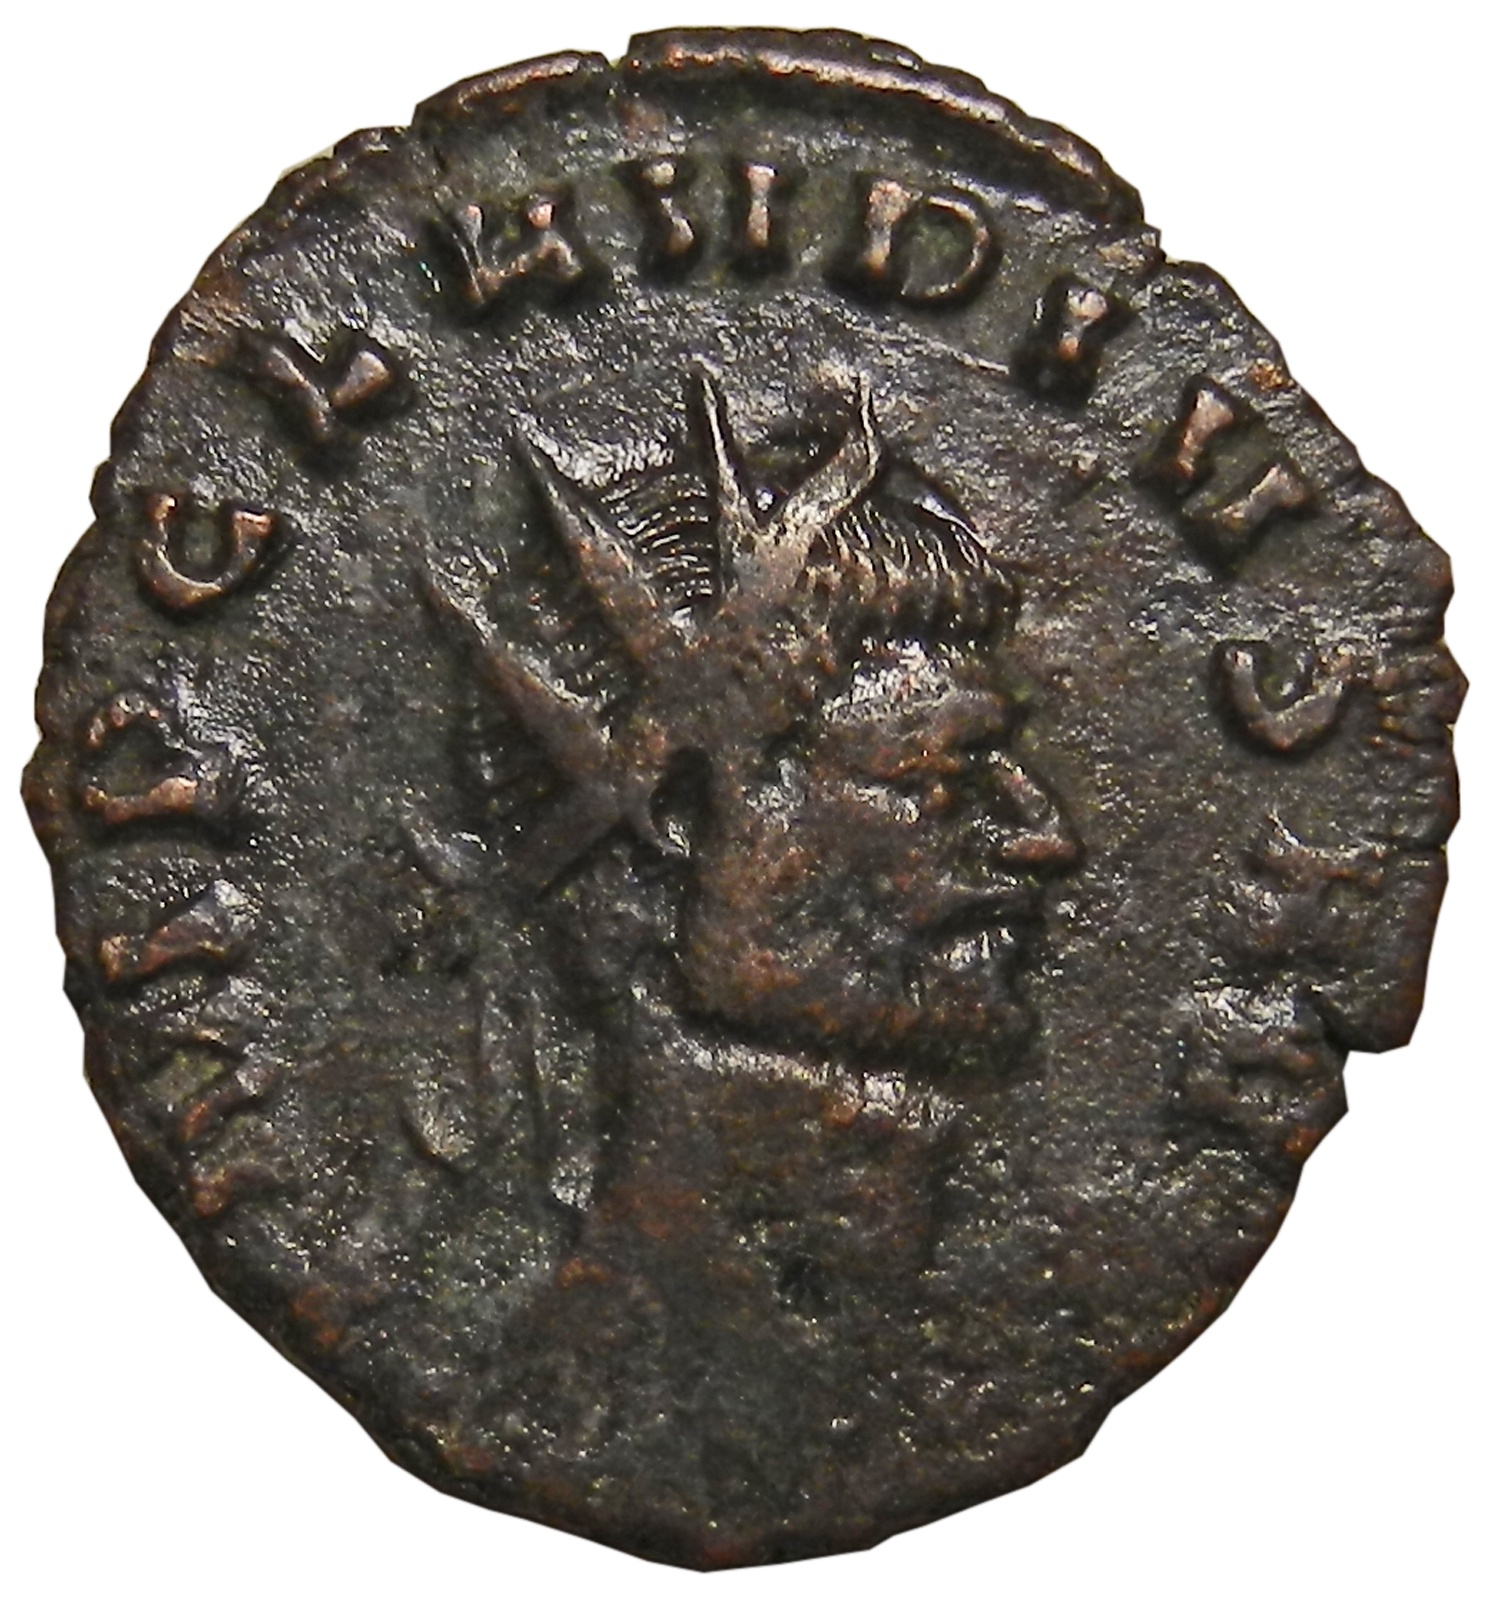 Монета антониниан. Клавдий II Готский. Бронза. Древний Рим, 268-270 гг (Юпитер)